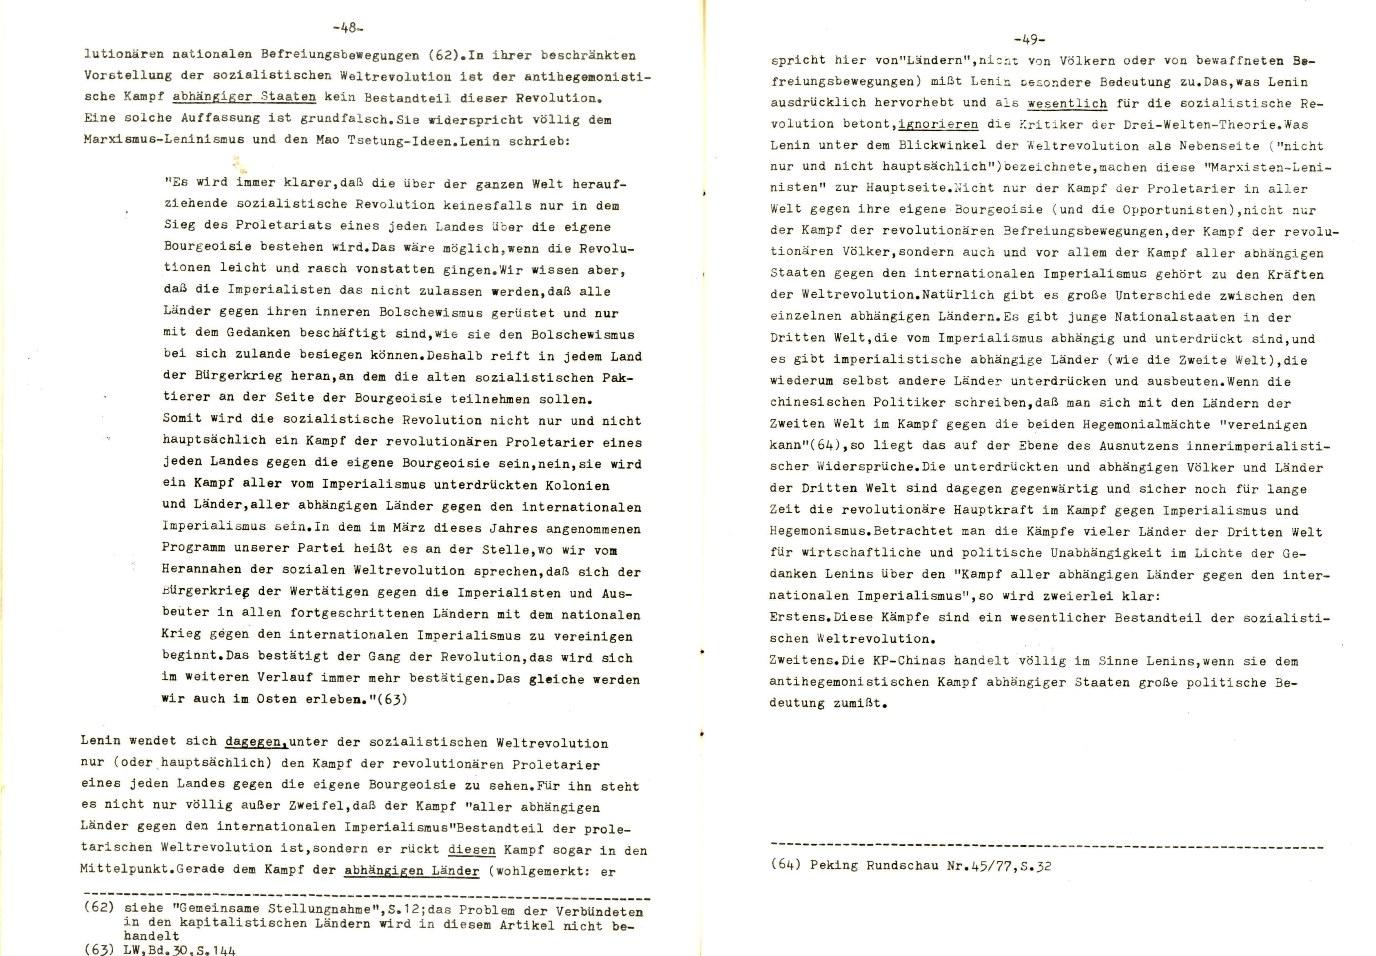 Muenchen_Kampf_dem_Revisionismus_1978_04_05_26